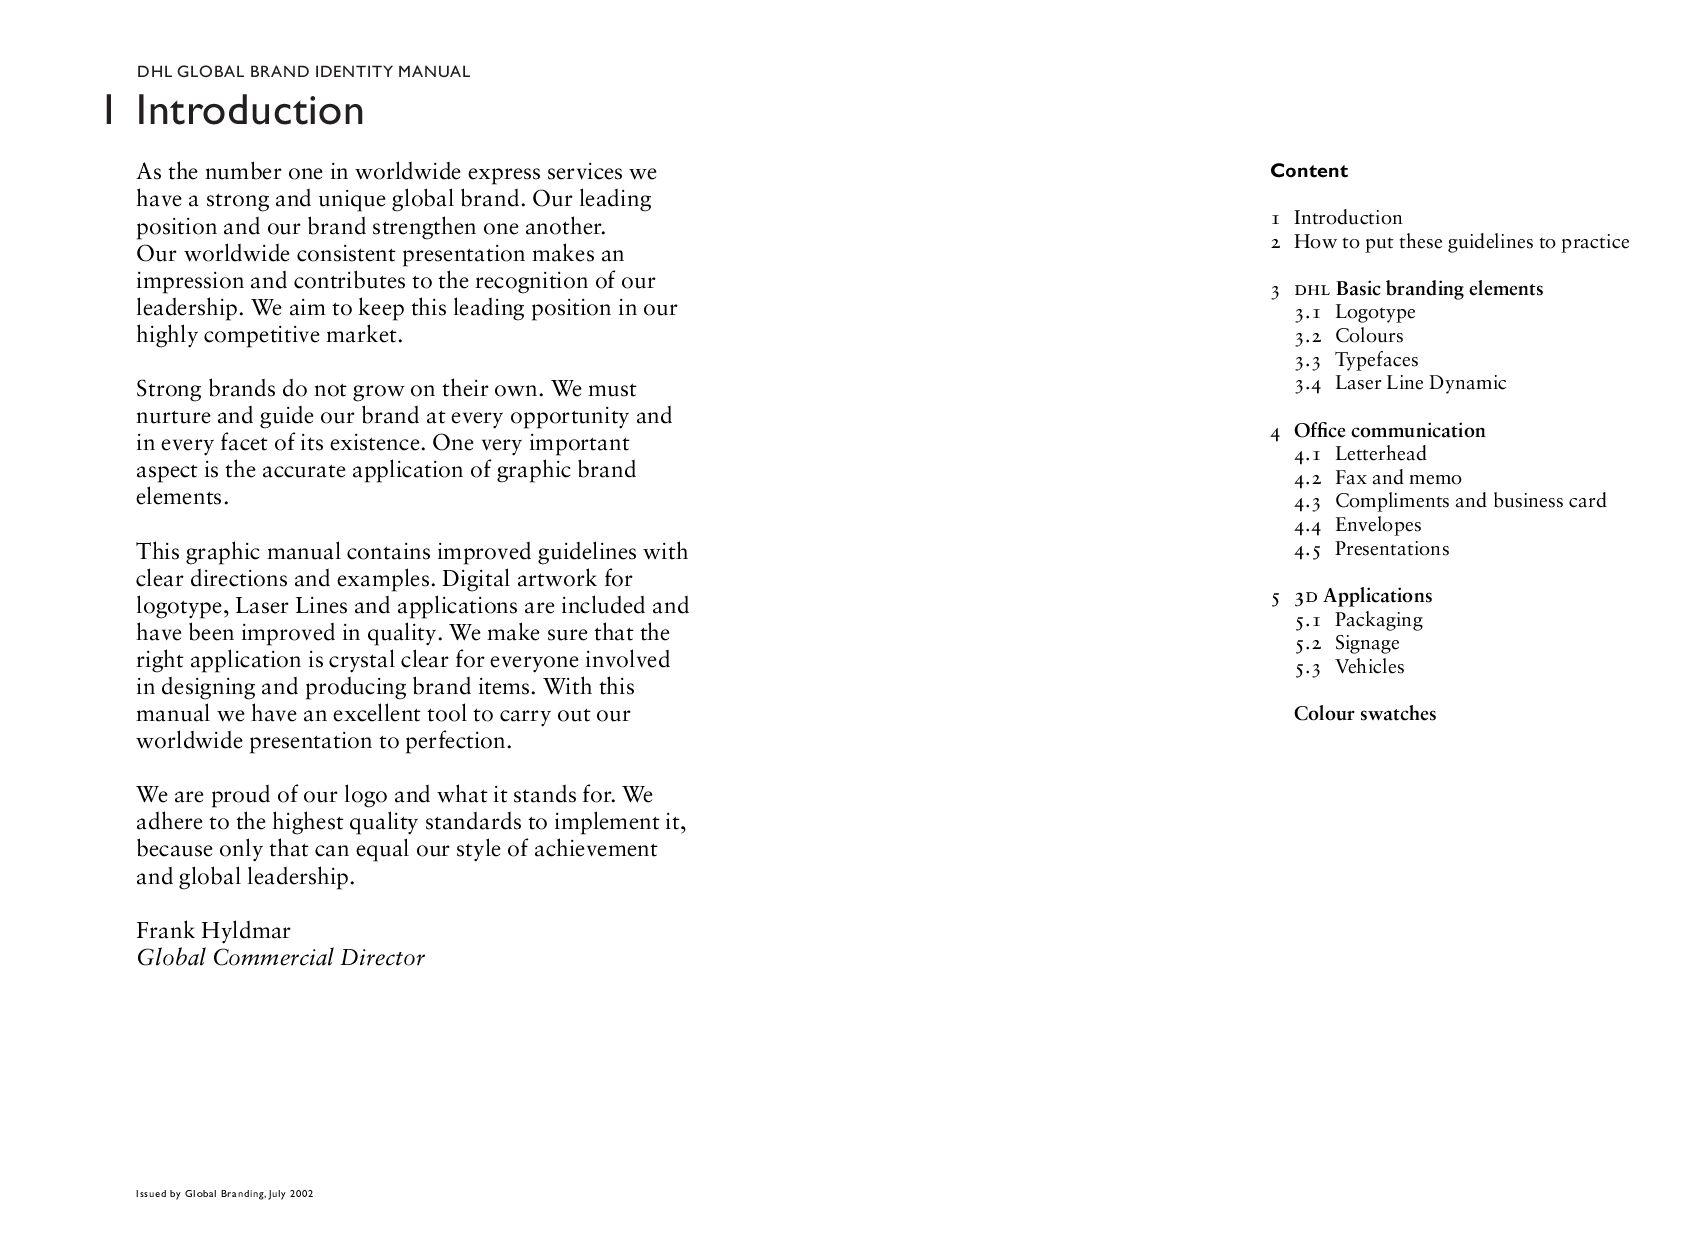 Dhl air express airway bill instructions - Dhl Air Express Airway Bill Instructions 42